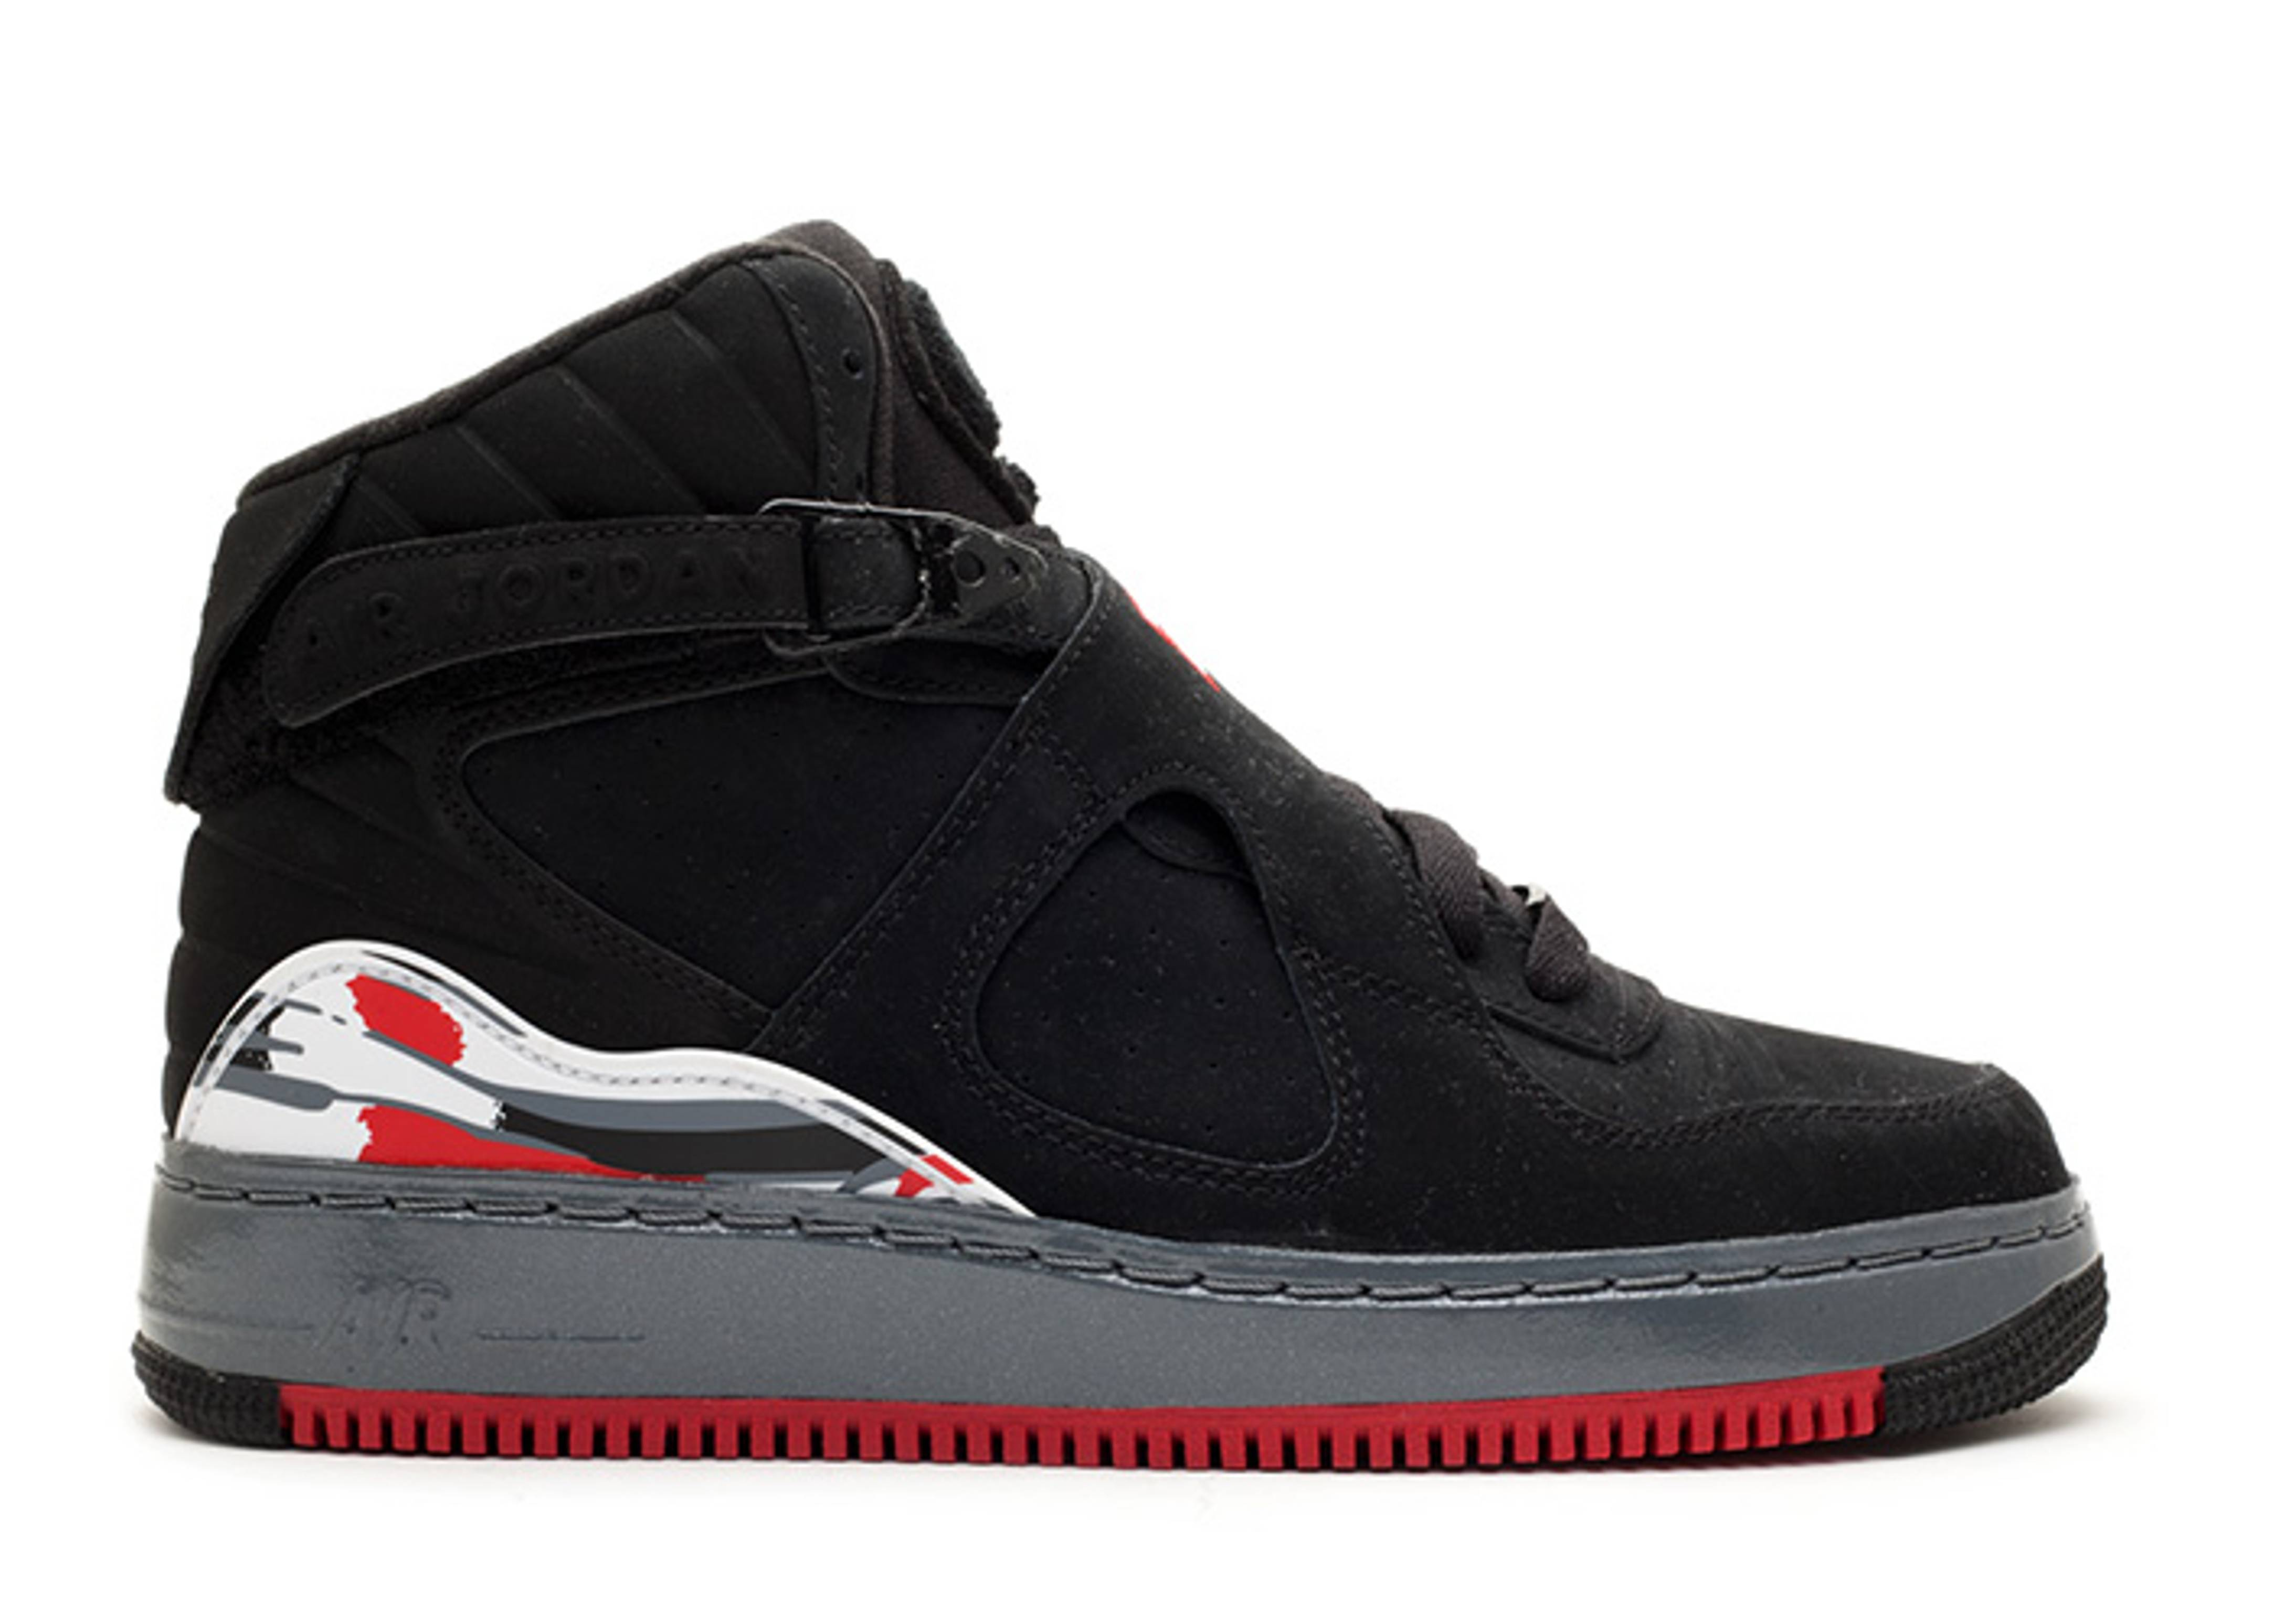 Ajf 8 - Air Jordan - 384522 001 - black varsity red-flint grey ... 4bf74064c